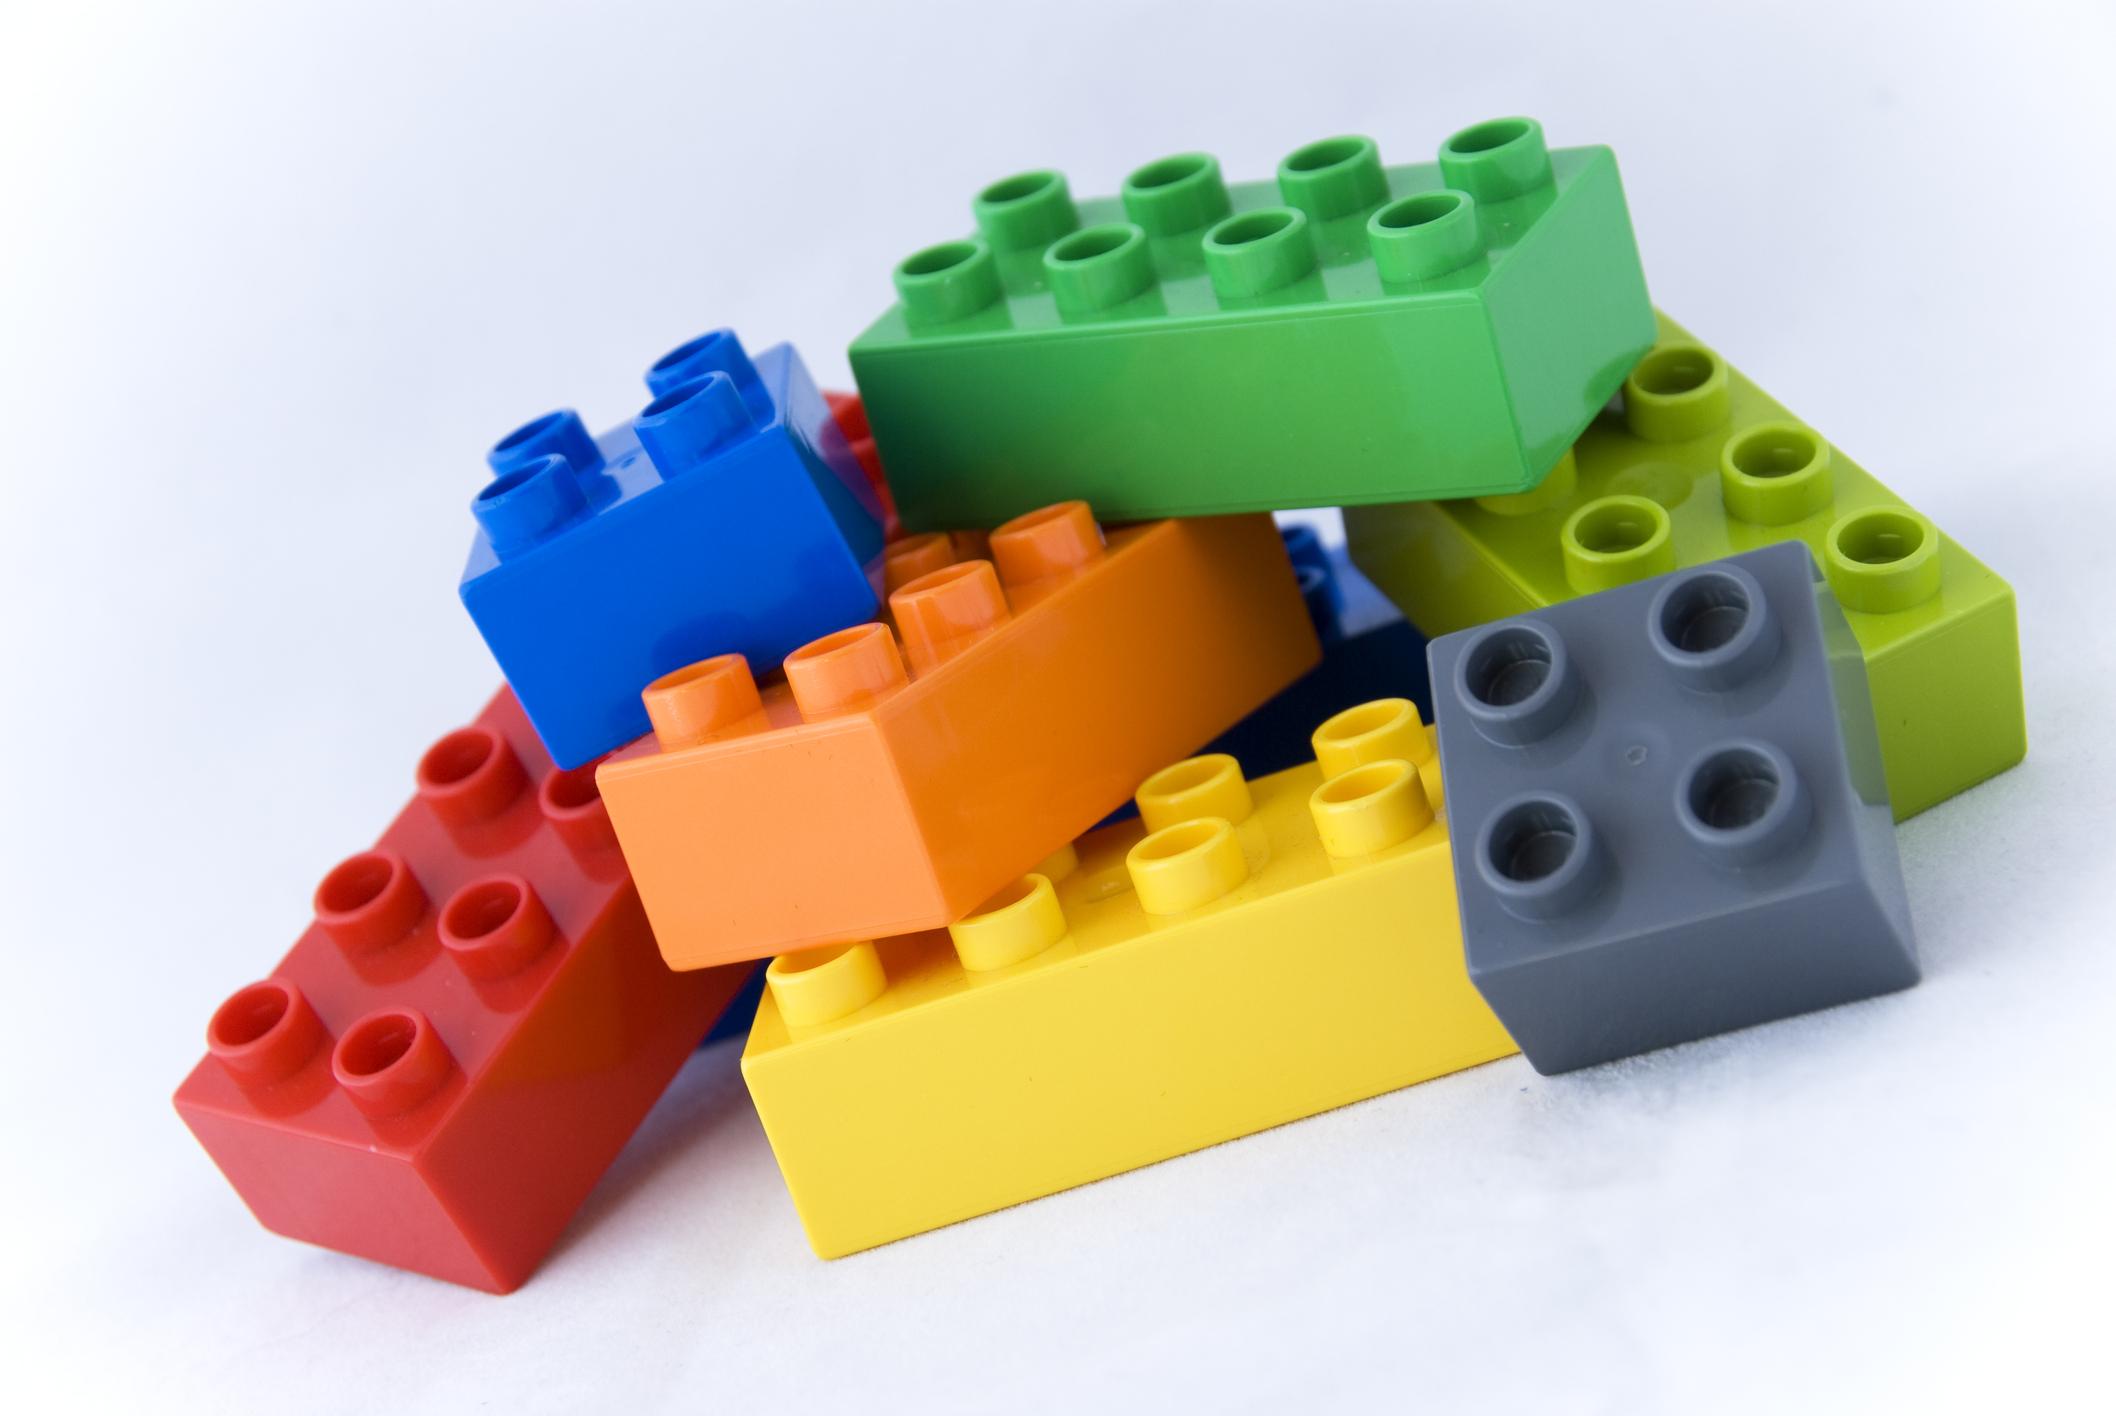 building blocks wallpaper hd: Lego Wallpapers High Quality